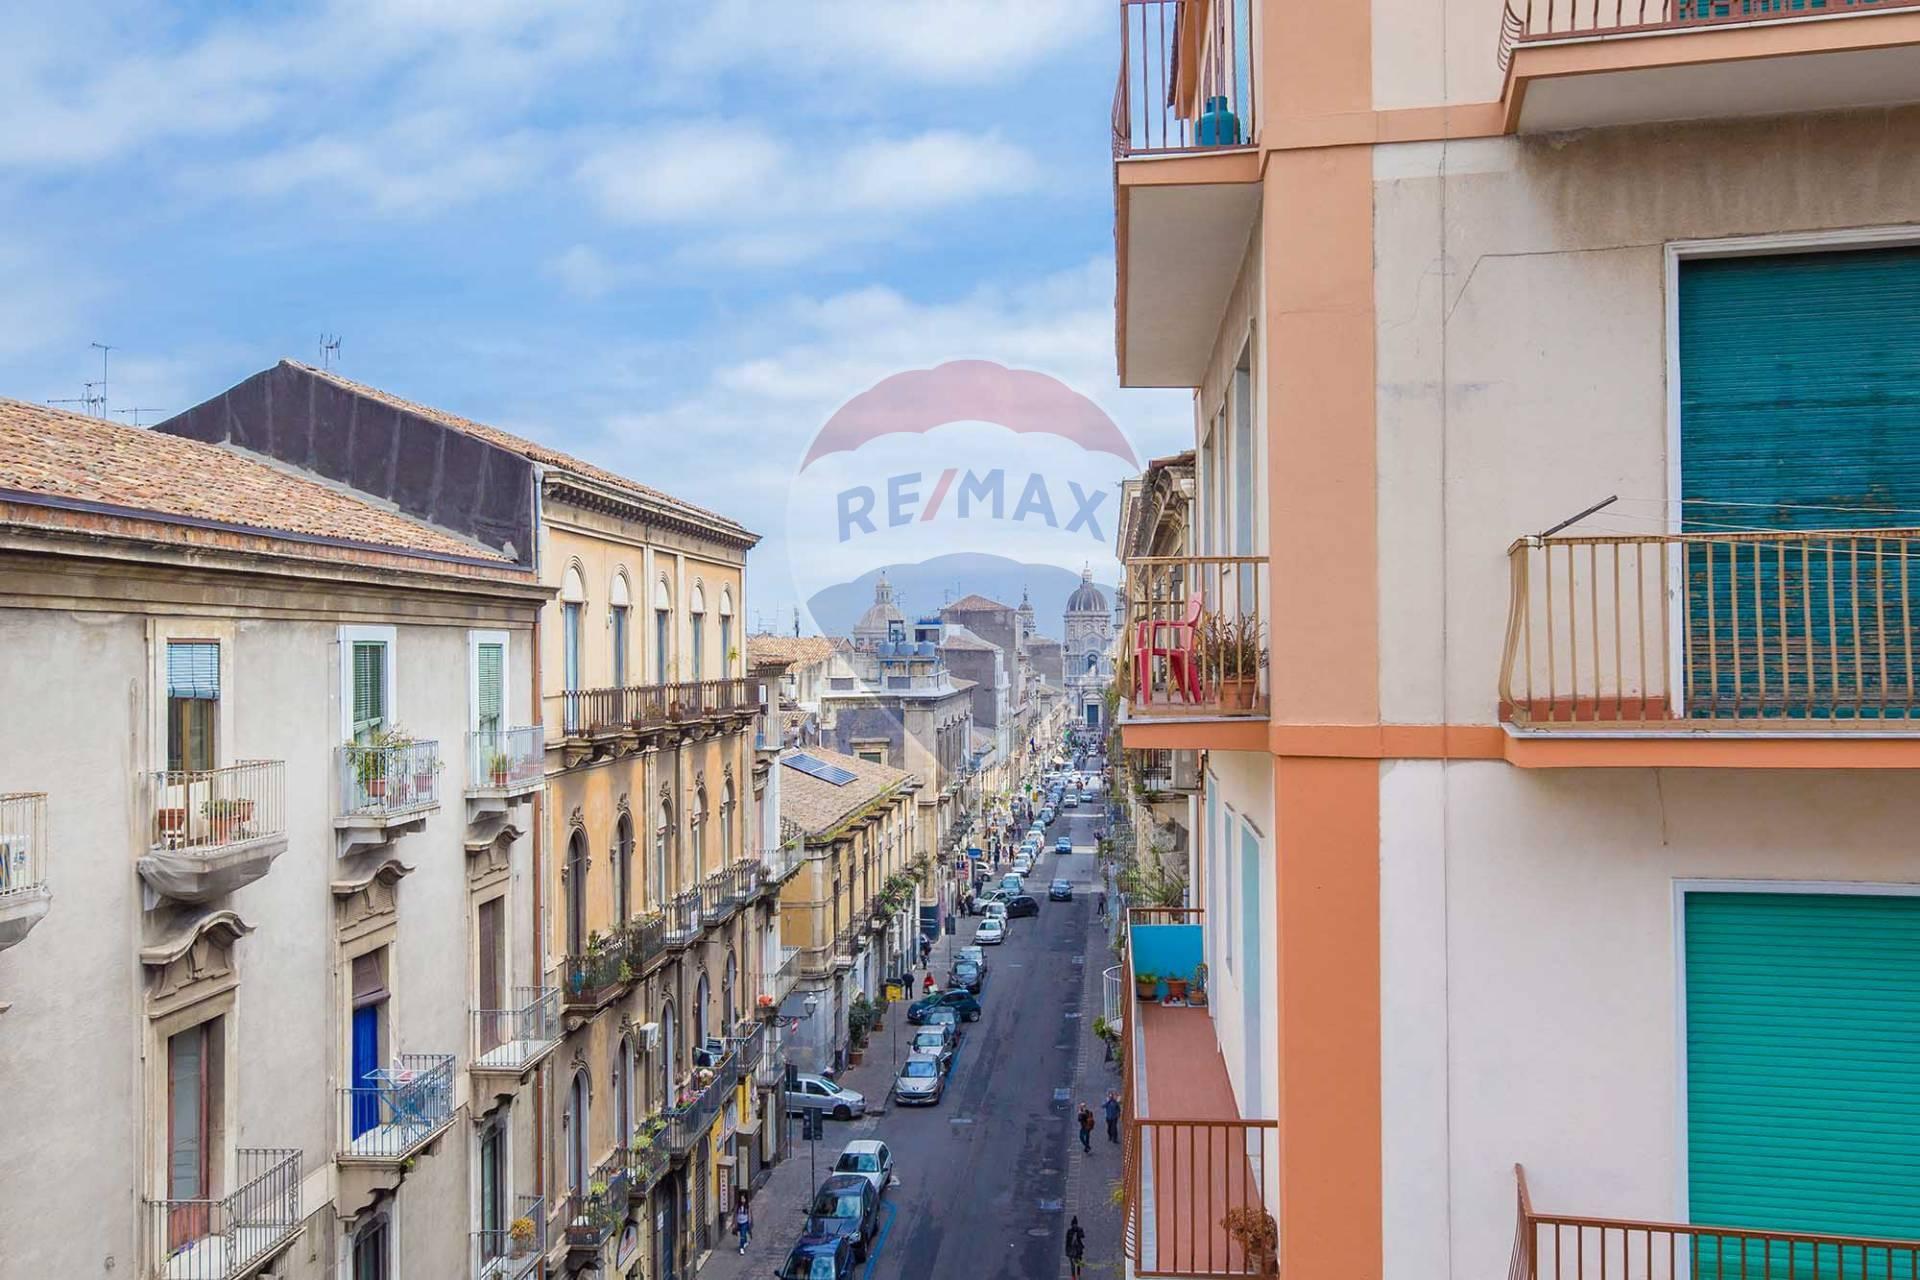 catania vendita quart: catania-centro storico,garibaldi,vittorio emanuele re/max city home